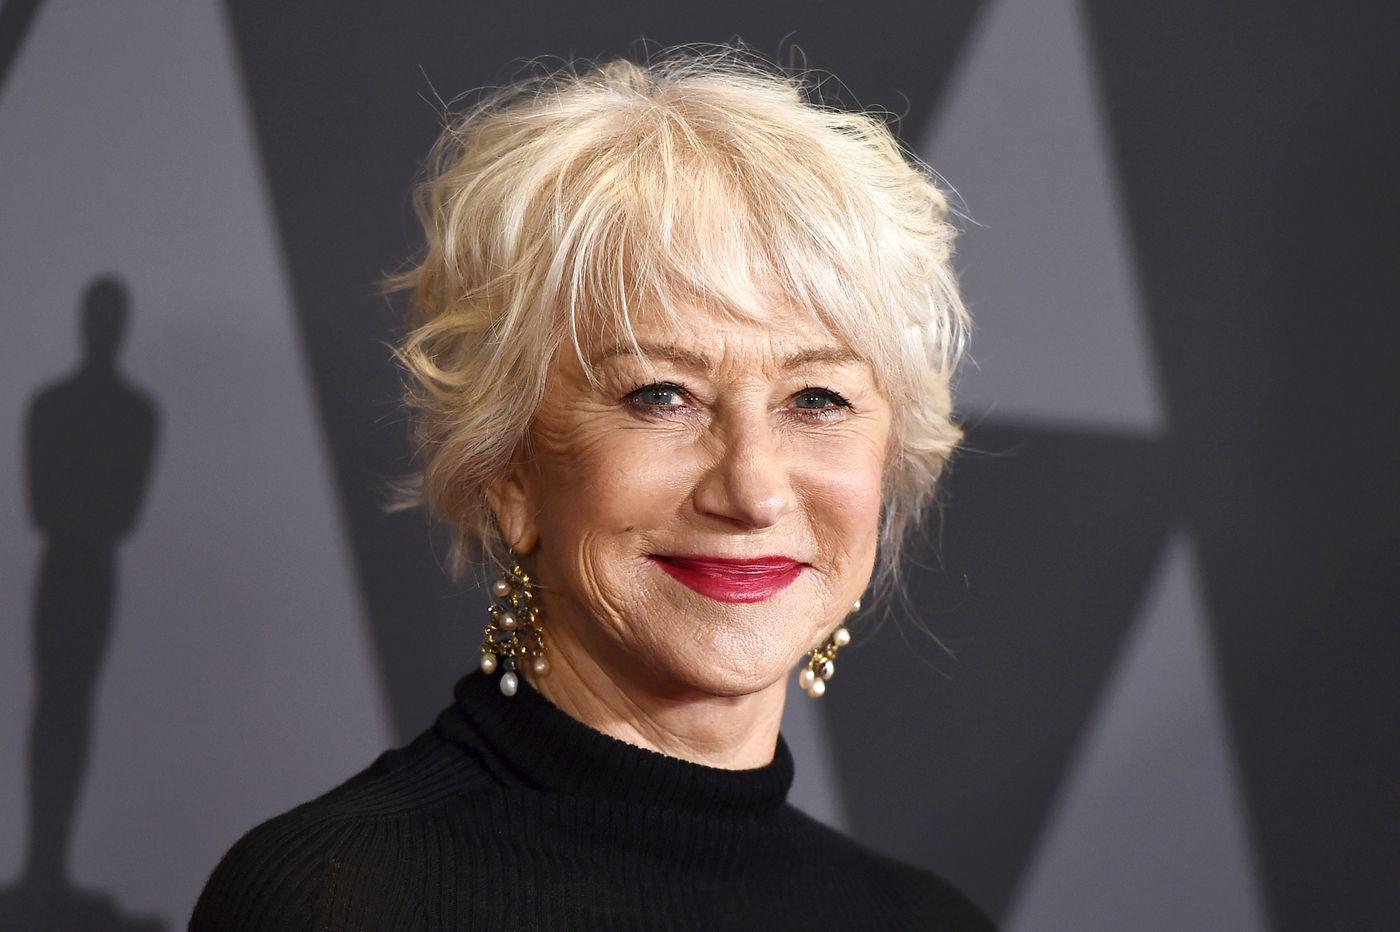 Helen Mirren will headline Academy of Music Anniversary Concert